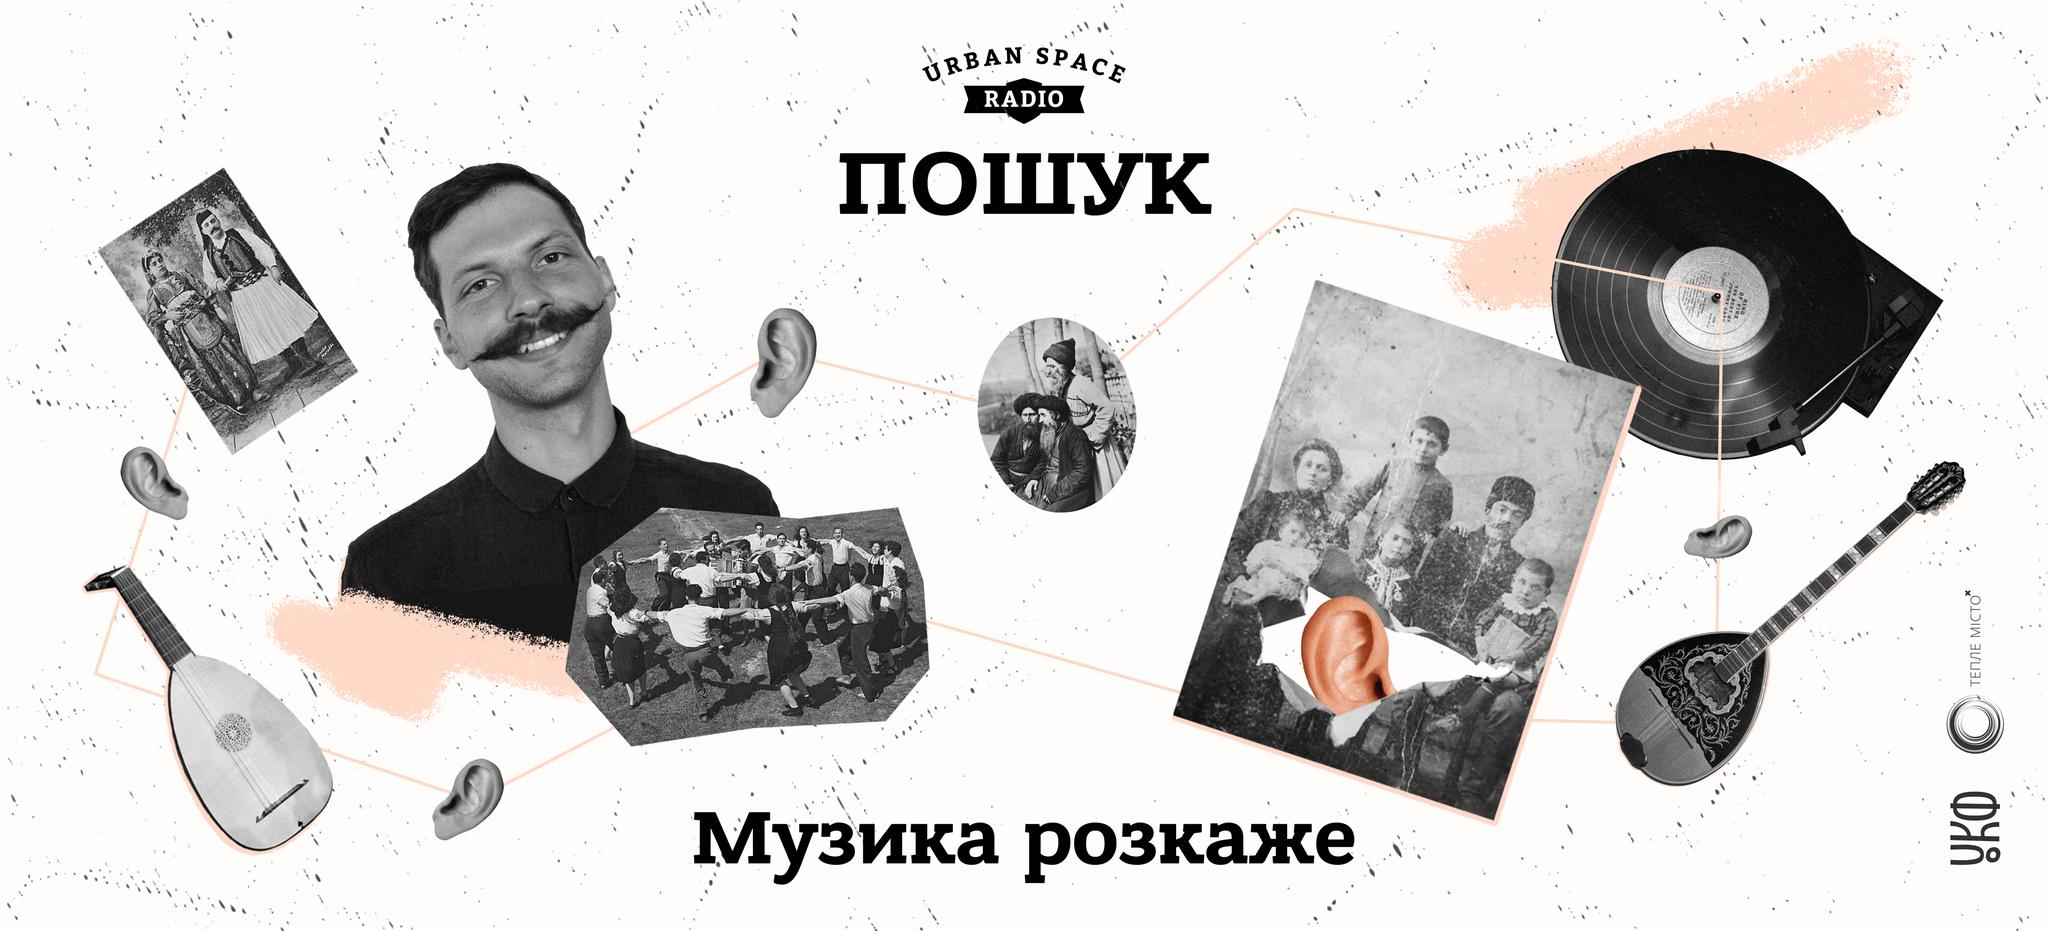 Болгари, греки та албанці: подкаст відUrban Space Radio розказує про музику нацменшин України (ФОТО)